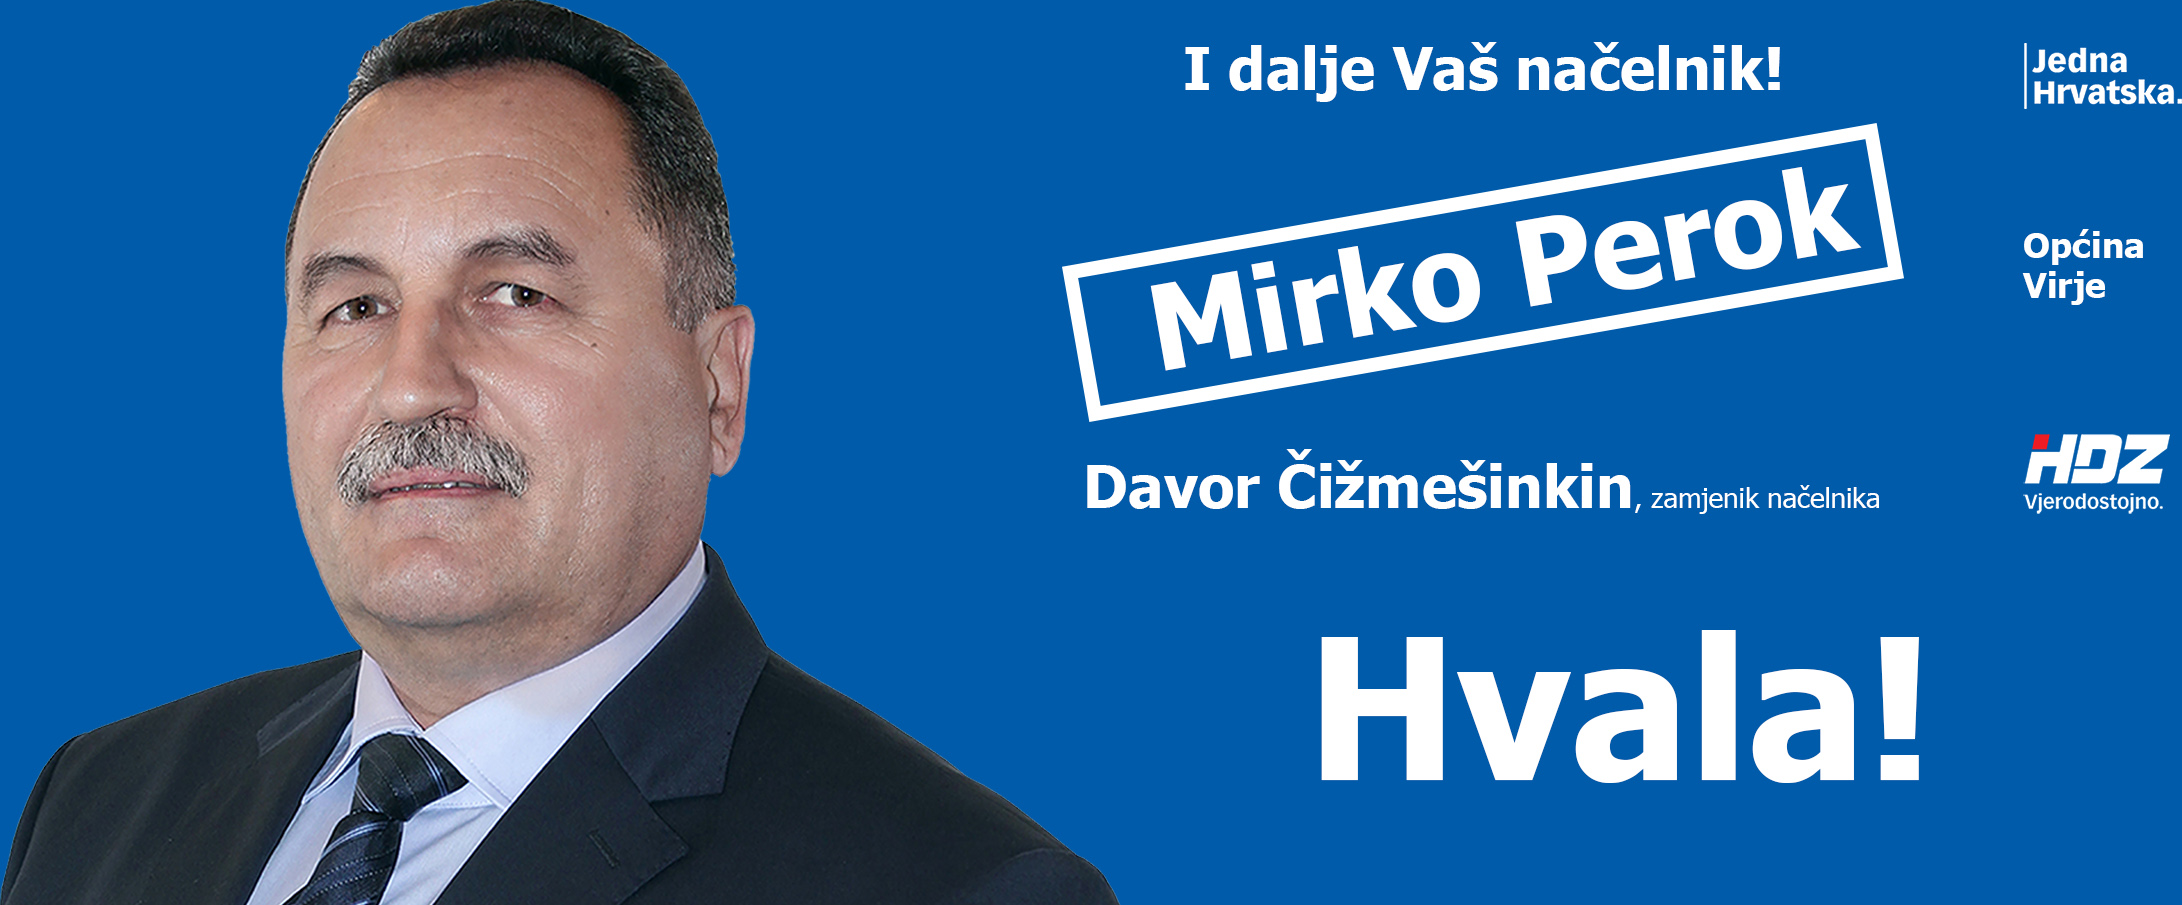 mirkoperok.com